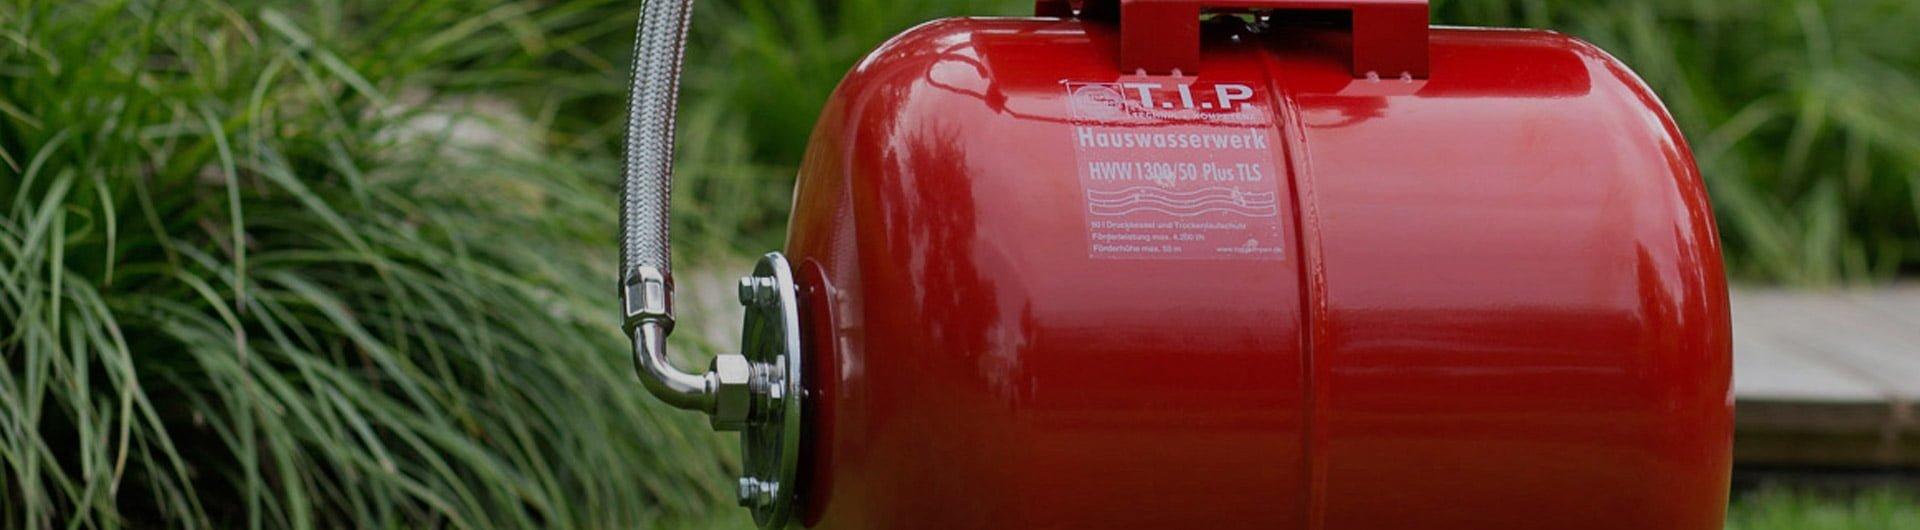 Sliderbild-50-liter-druckkessel